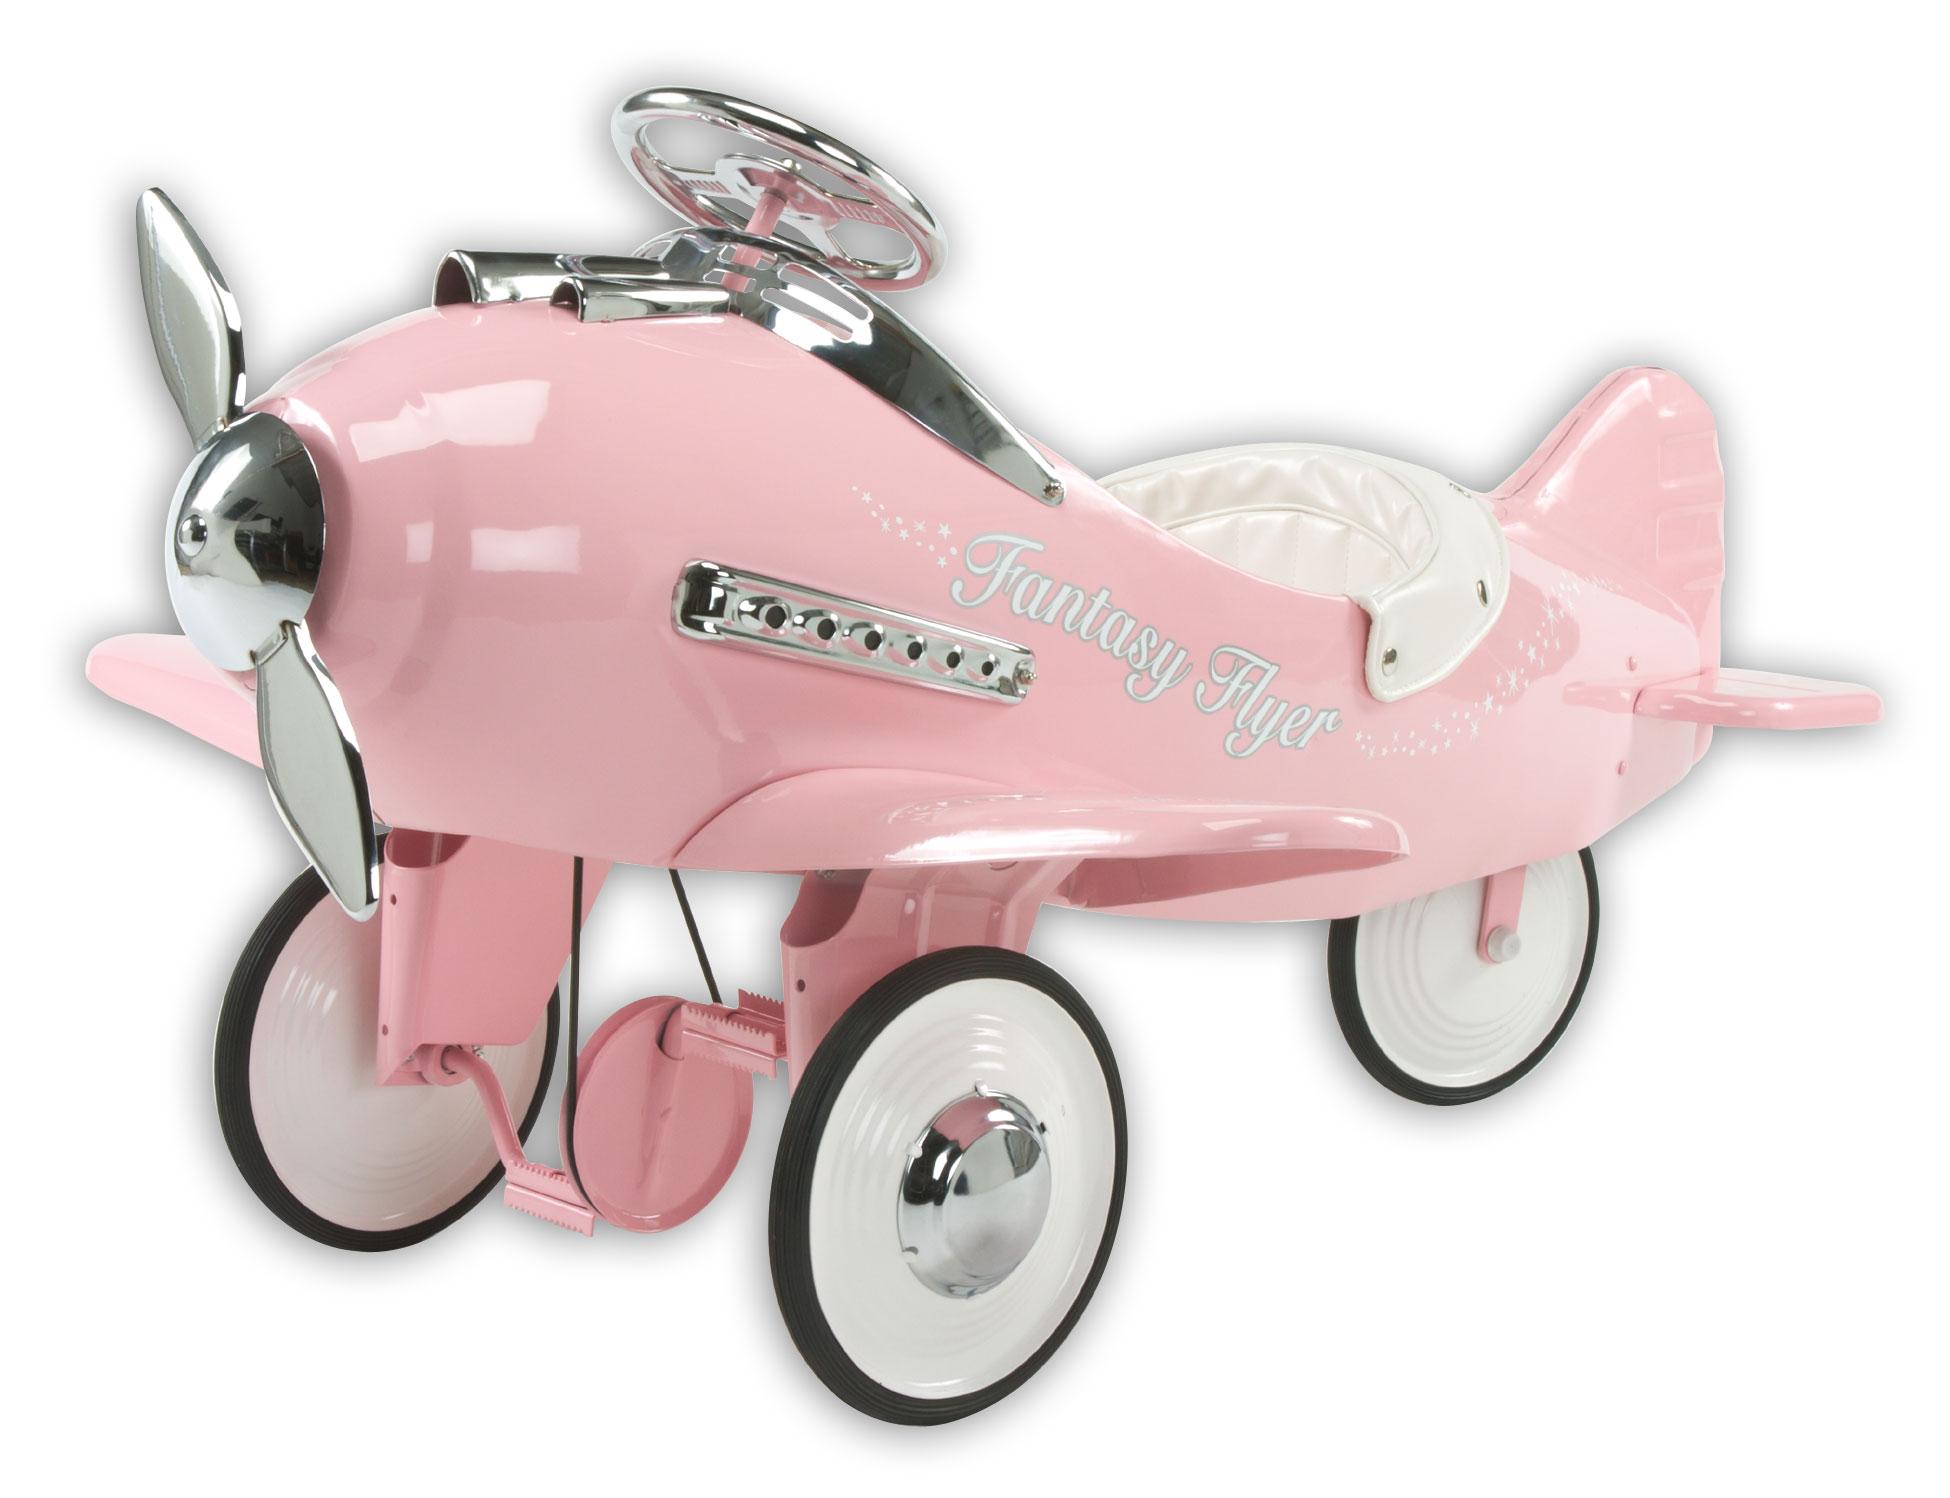 Pink Fantasy Flyer Pedal Plane